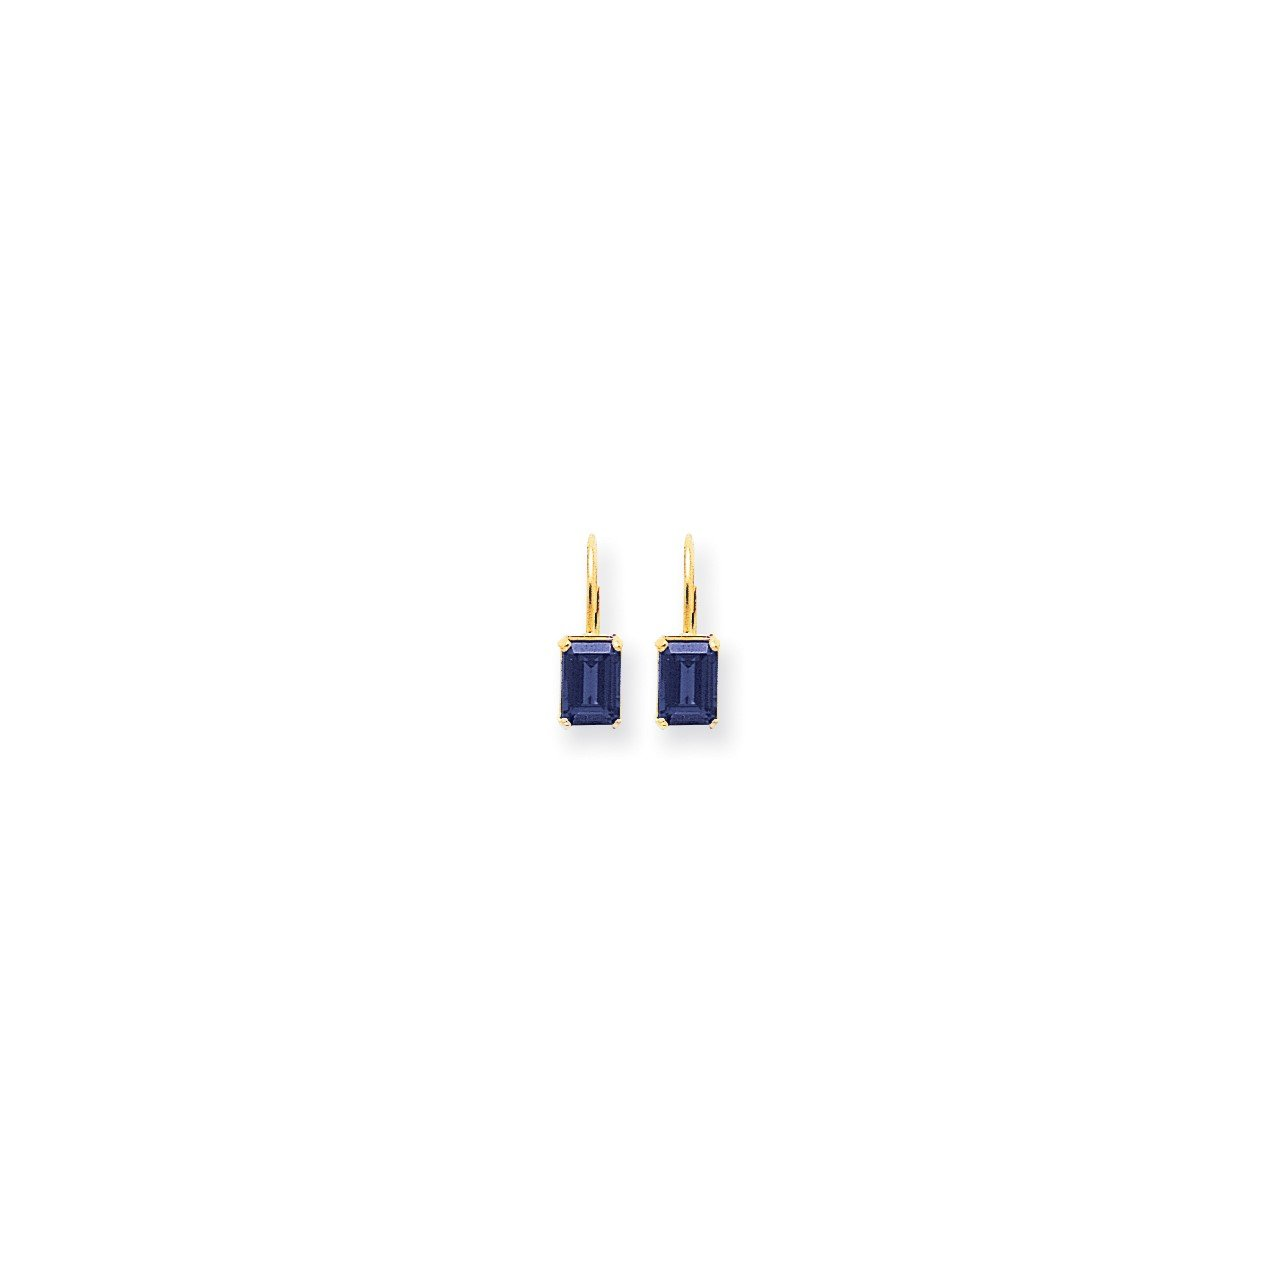 14k 7x5mm Emerald Cut Sapphire earring